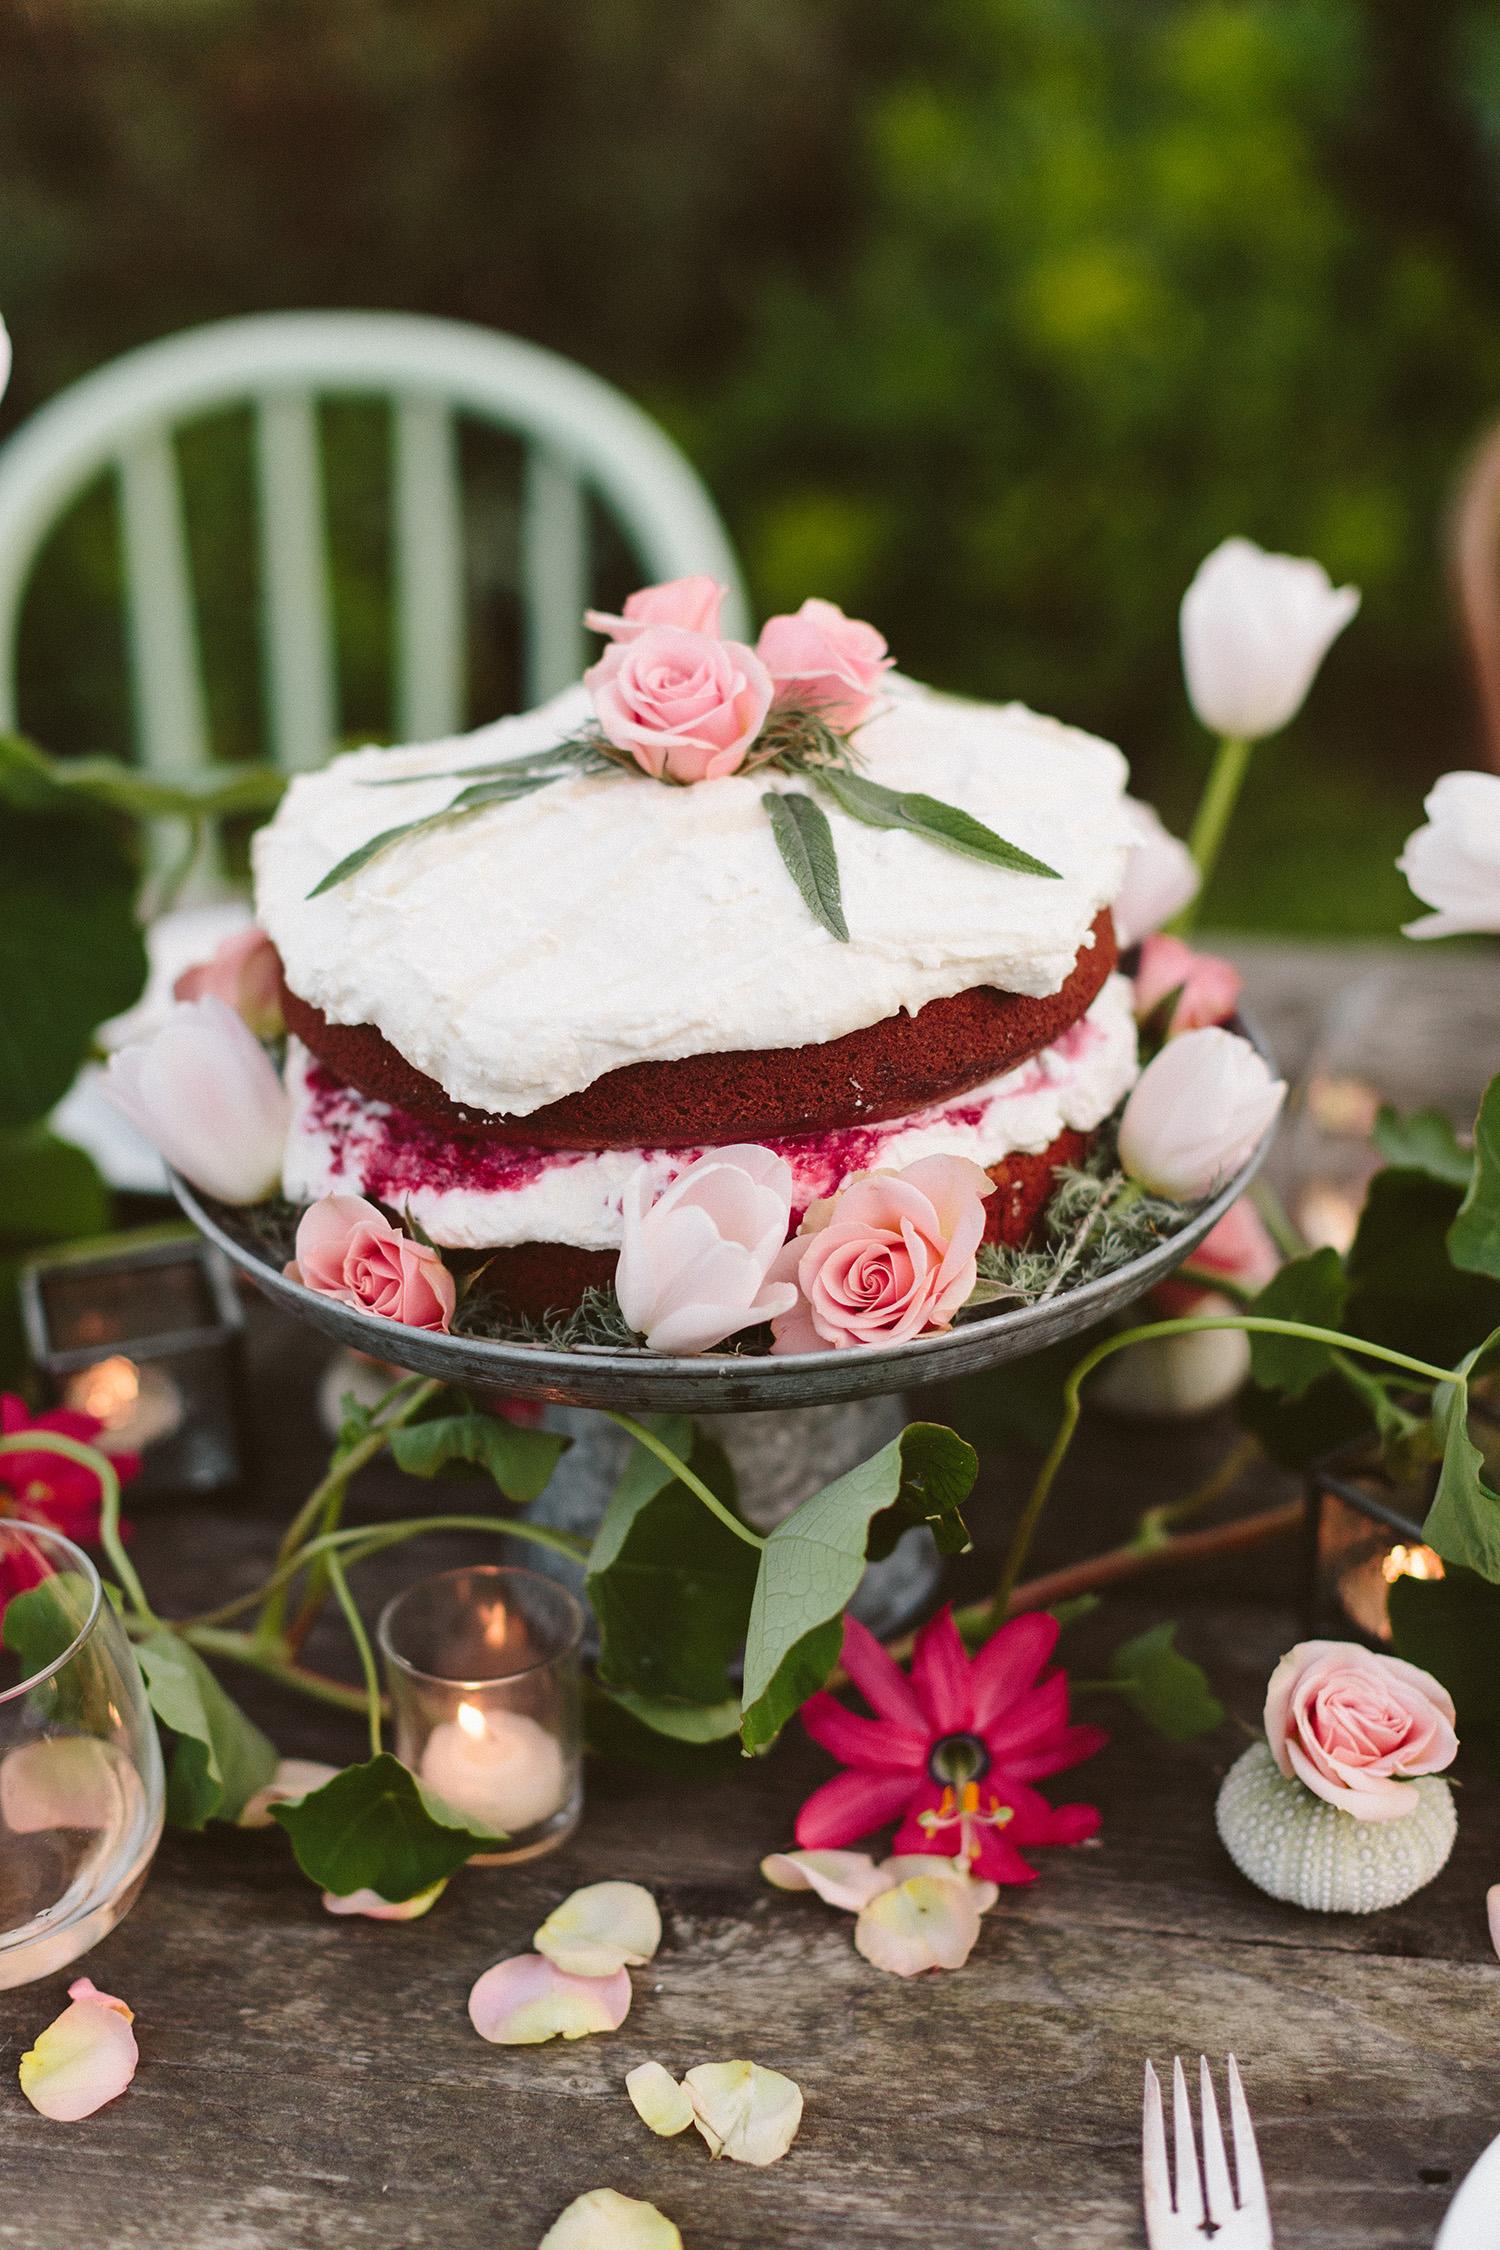 CakeParty_071_1.jpg